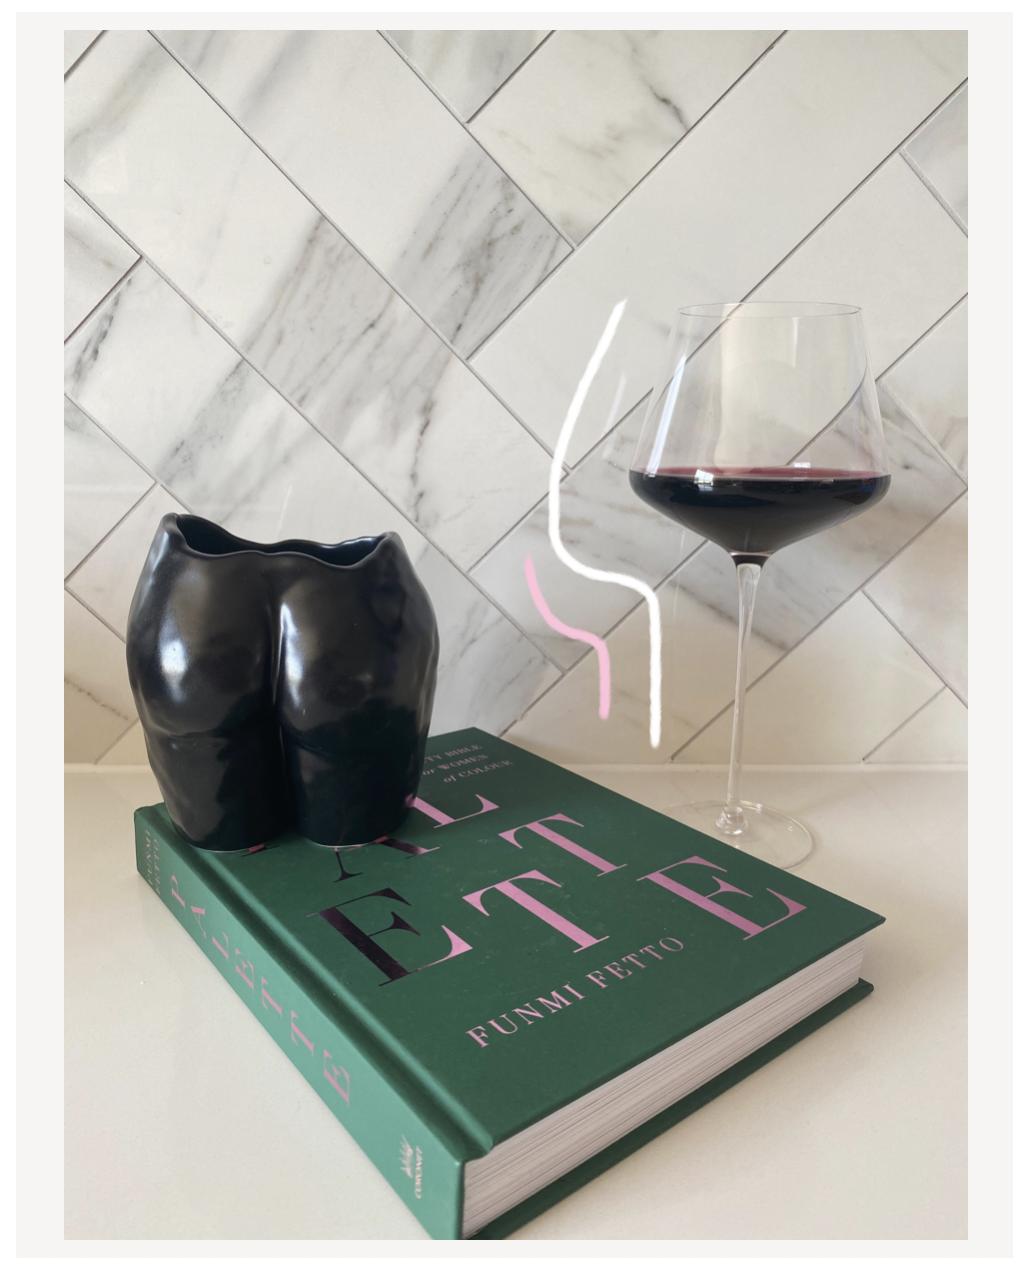 WFH Profile 2: The Wine Enthusiast